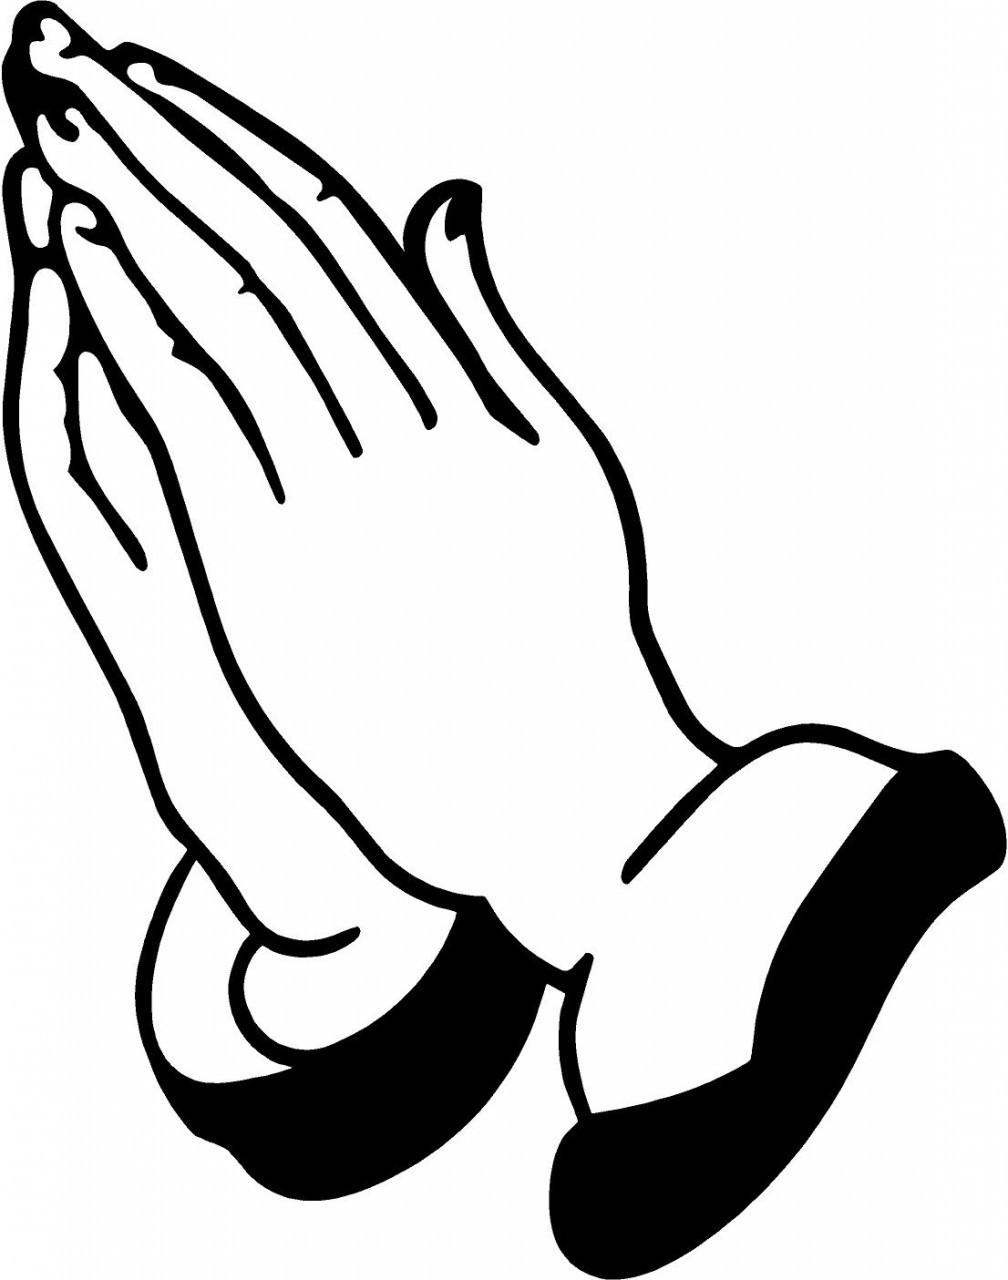 1008x1280 A Prayer For Donald Trump Extra Newsfeed